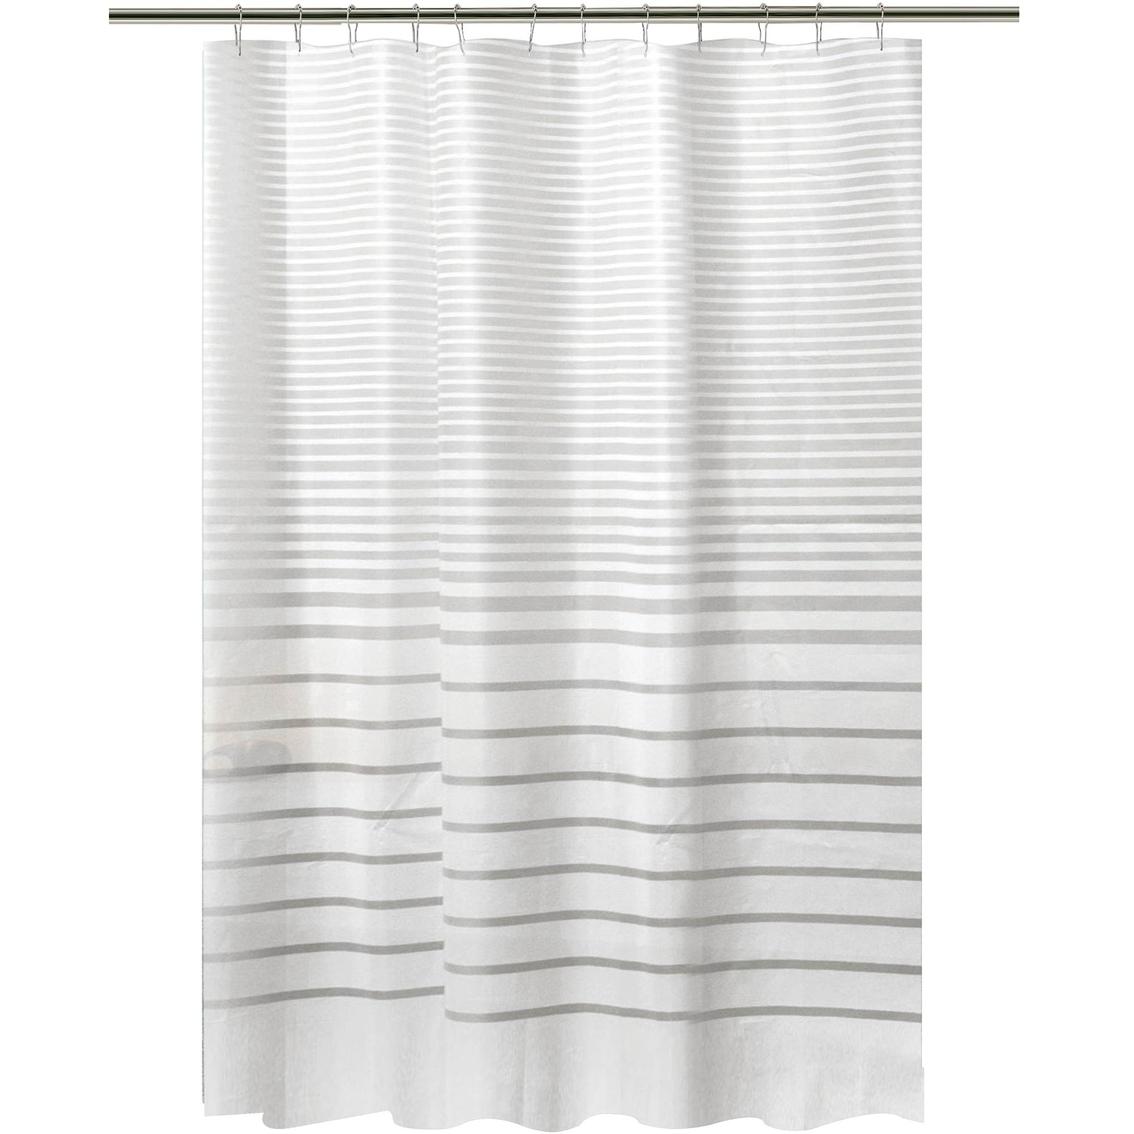 Bath Bliss Stripe Design Shower Curtain Shower Curtains Hooks